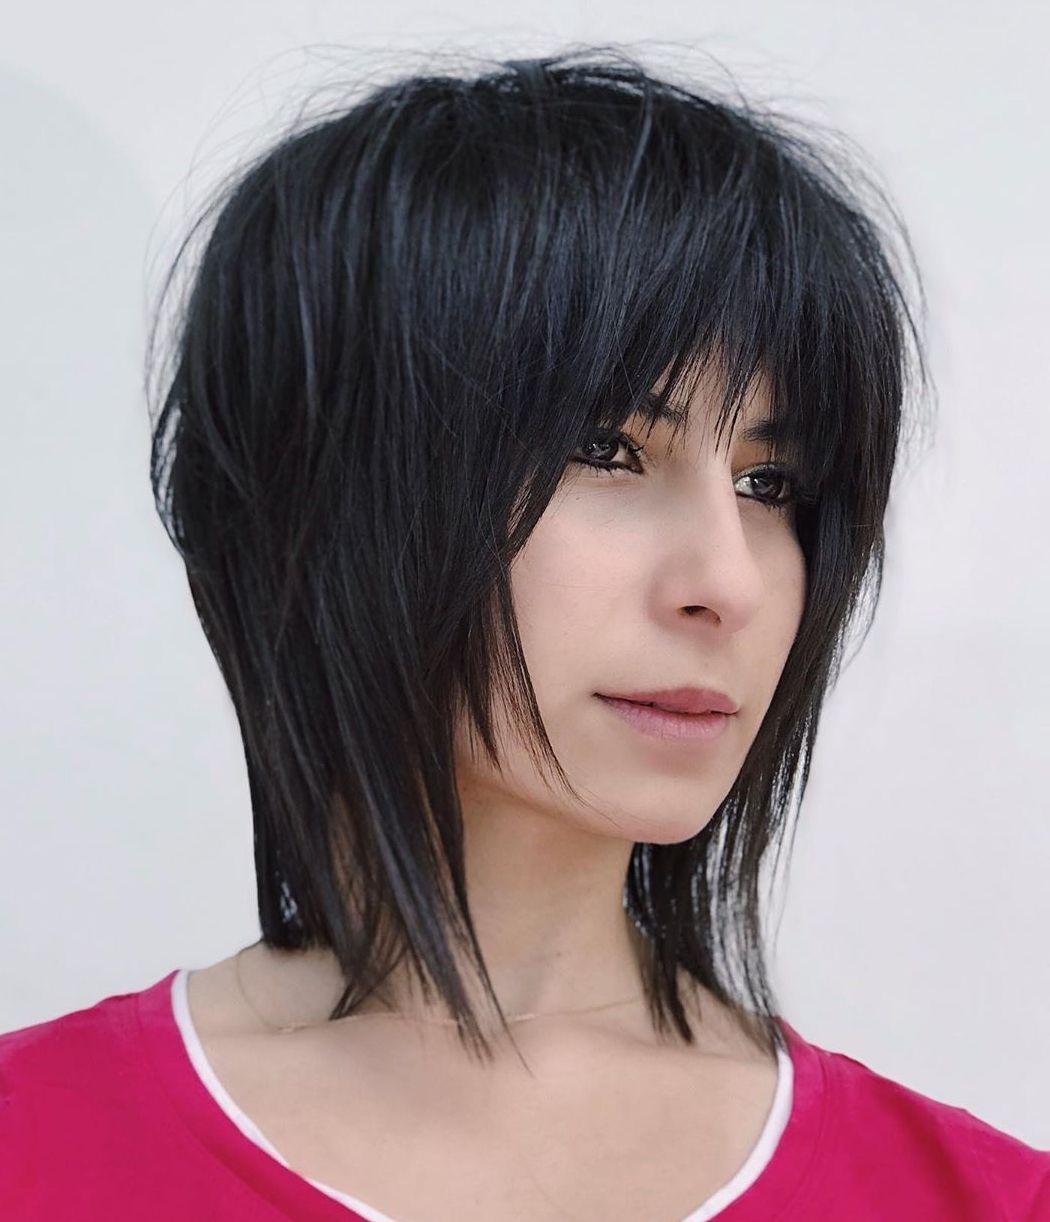 Choppy Medium Length Shag for Thick Hair